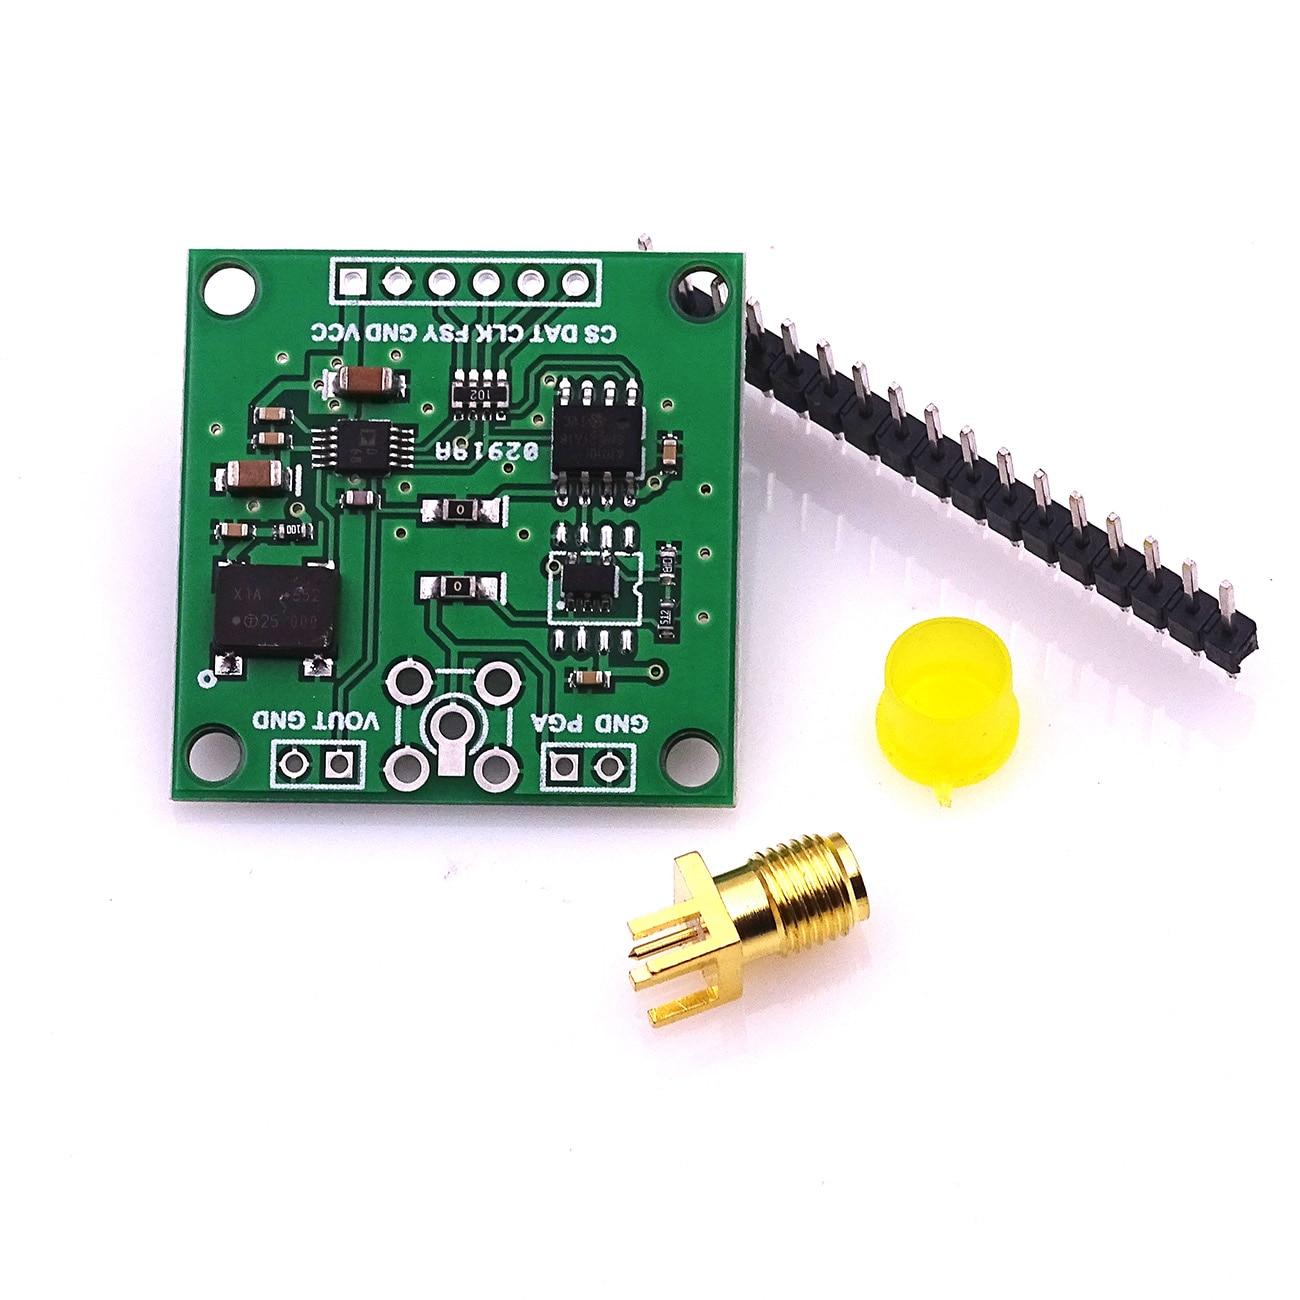 5PCS New AD9833 DDS Signal Generator Module 0 12 5 MHz Square Triangle Sine Wave